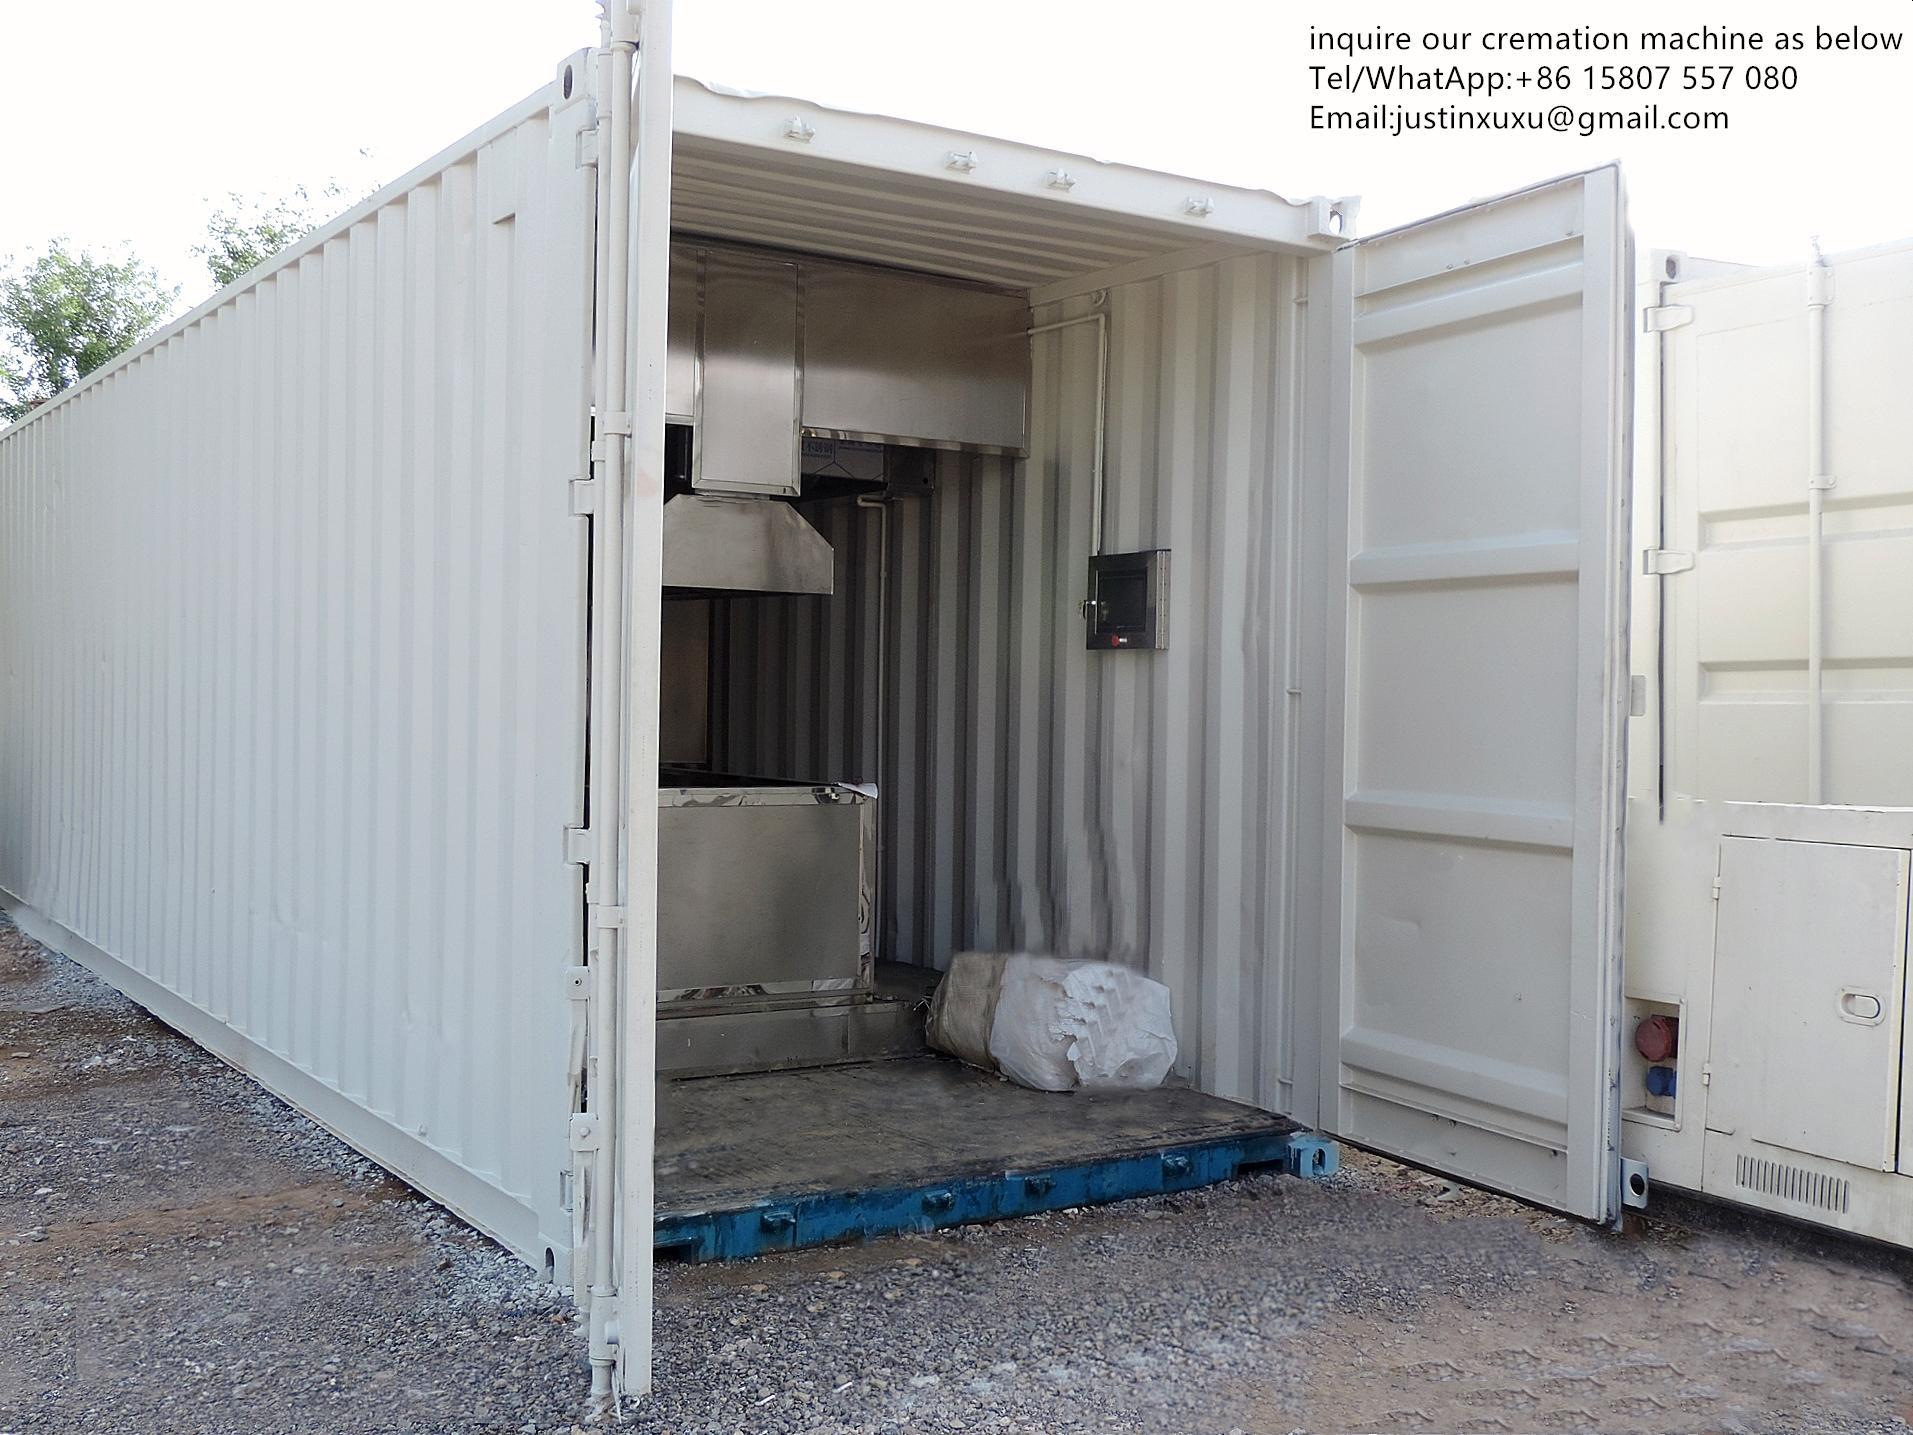 truck trailer crematorium machine emergency lorry designed for Russia market  1